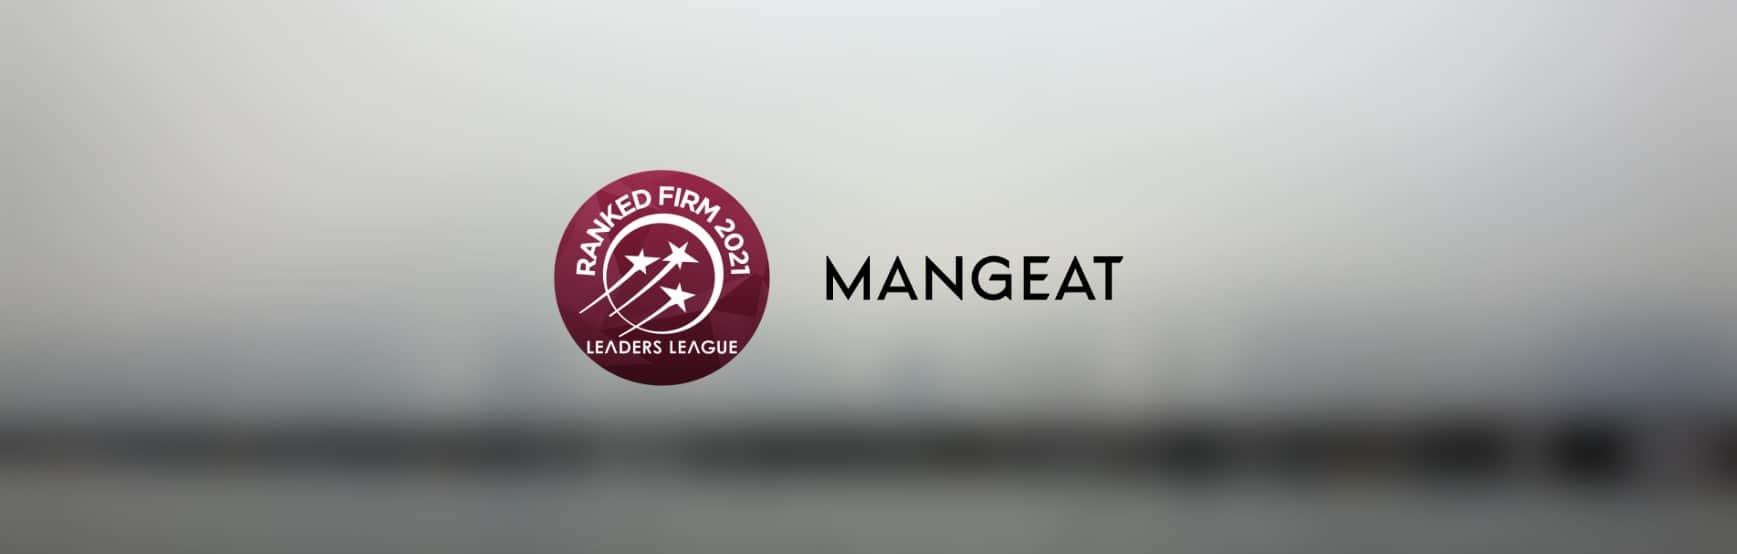 leaders league ranking 2021